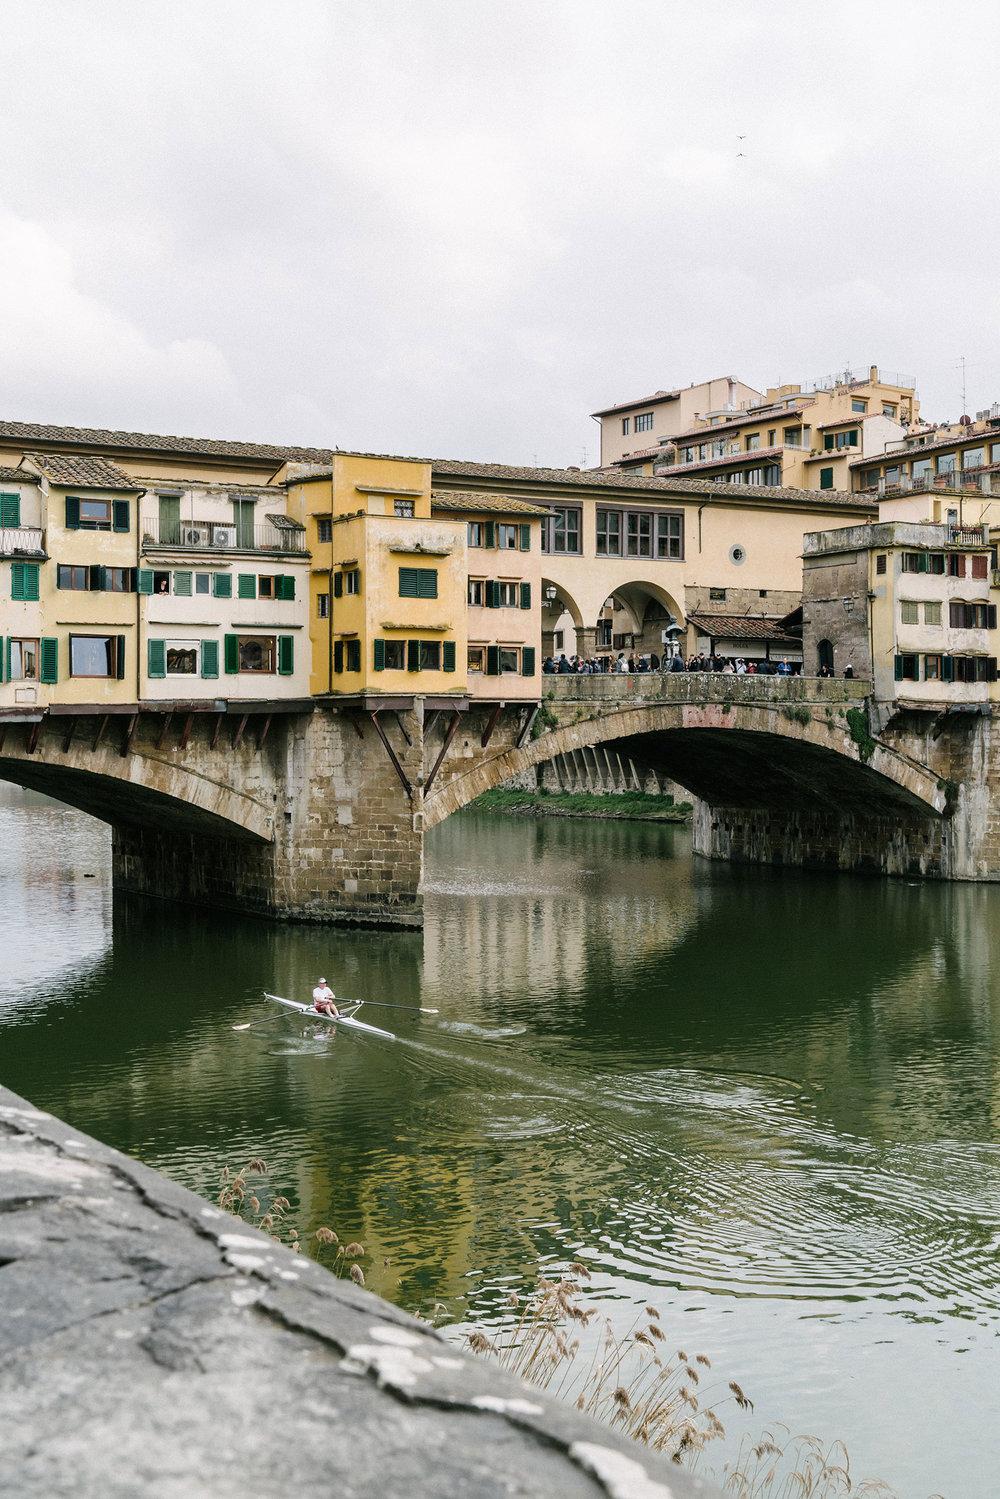 Ponte Vecchio, the oldest bridge in Florence